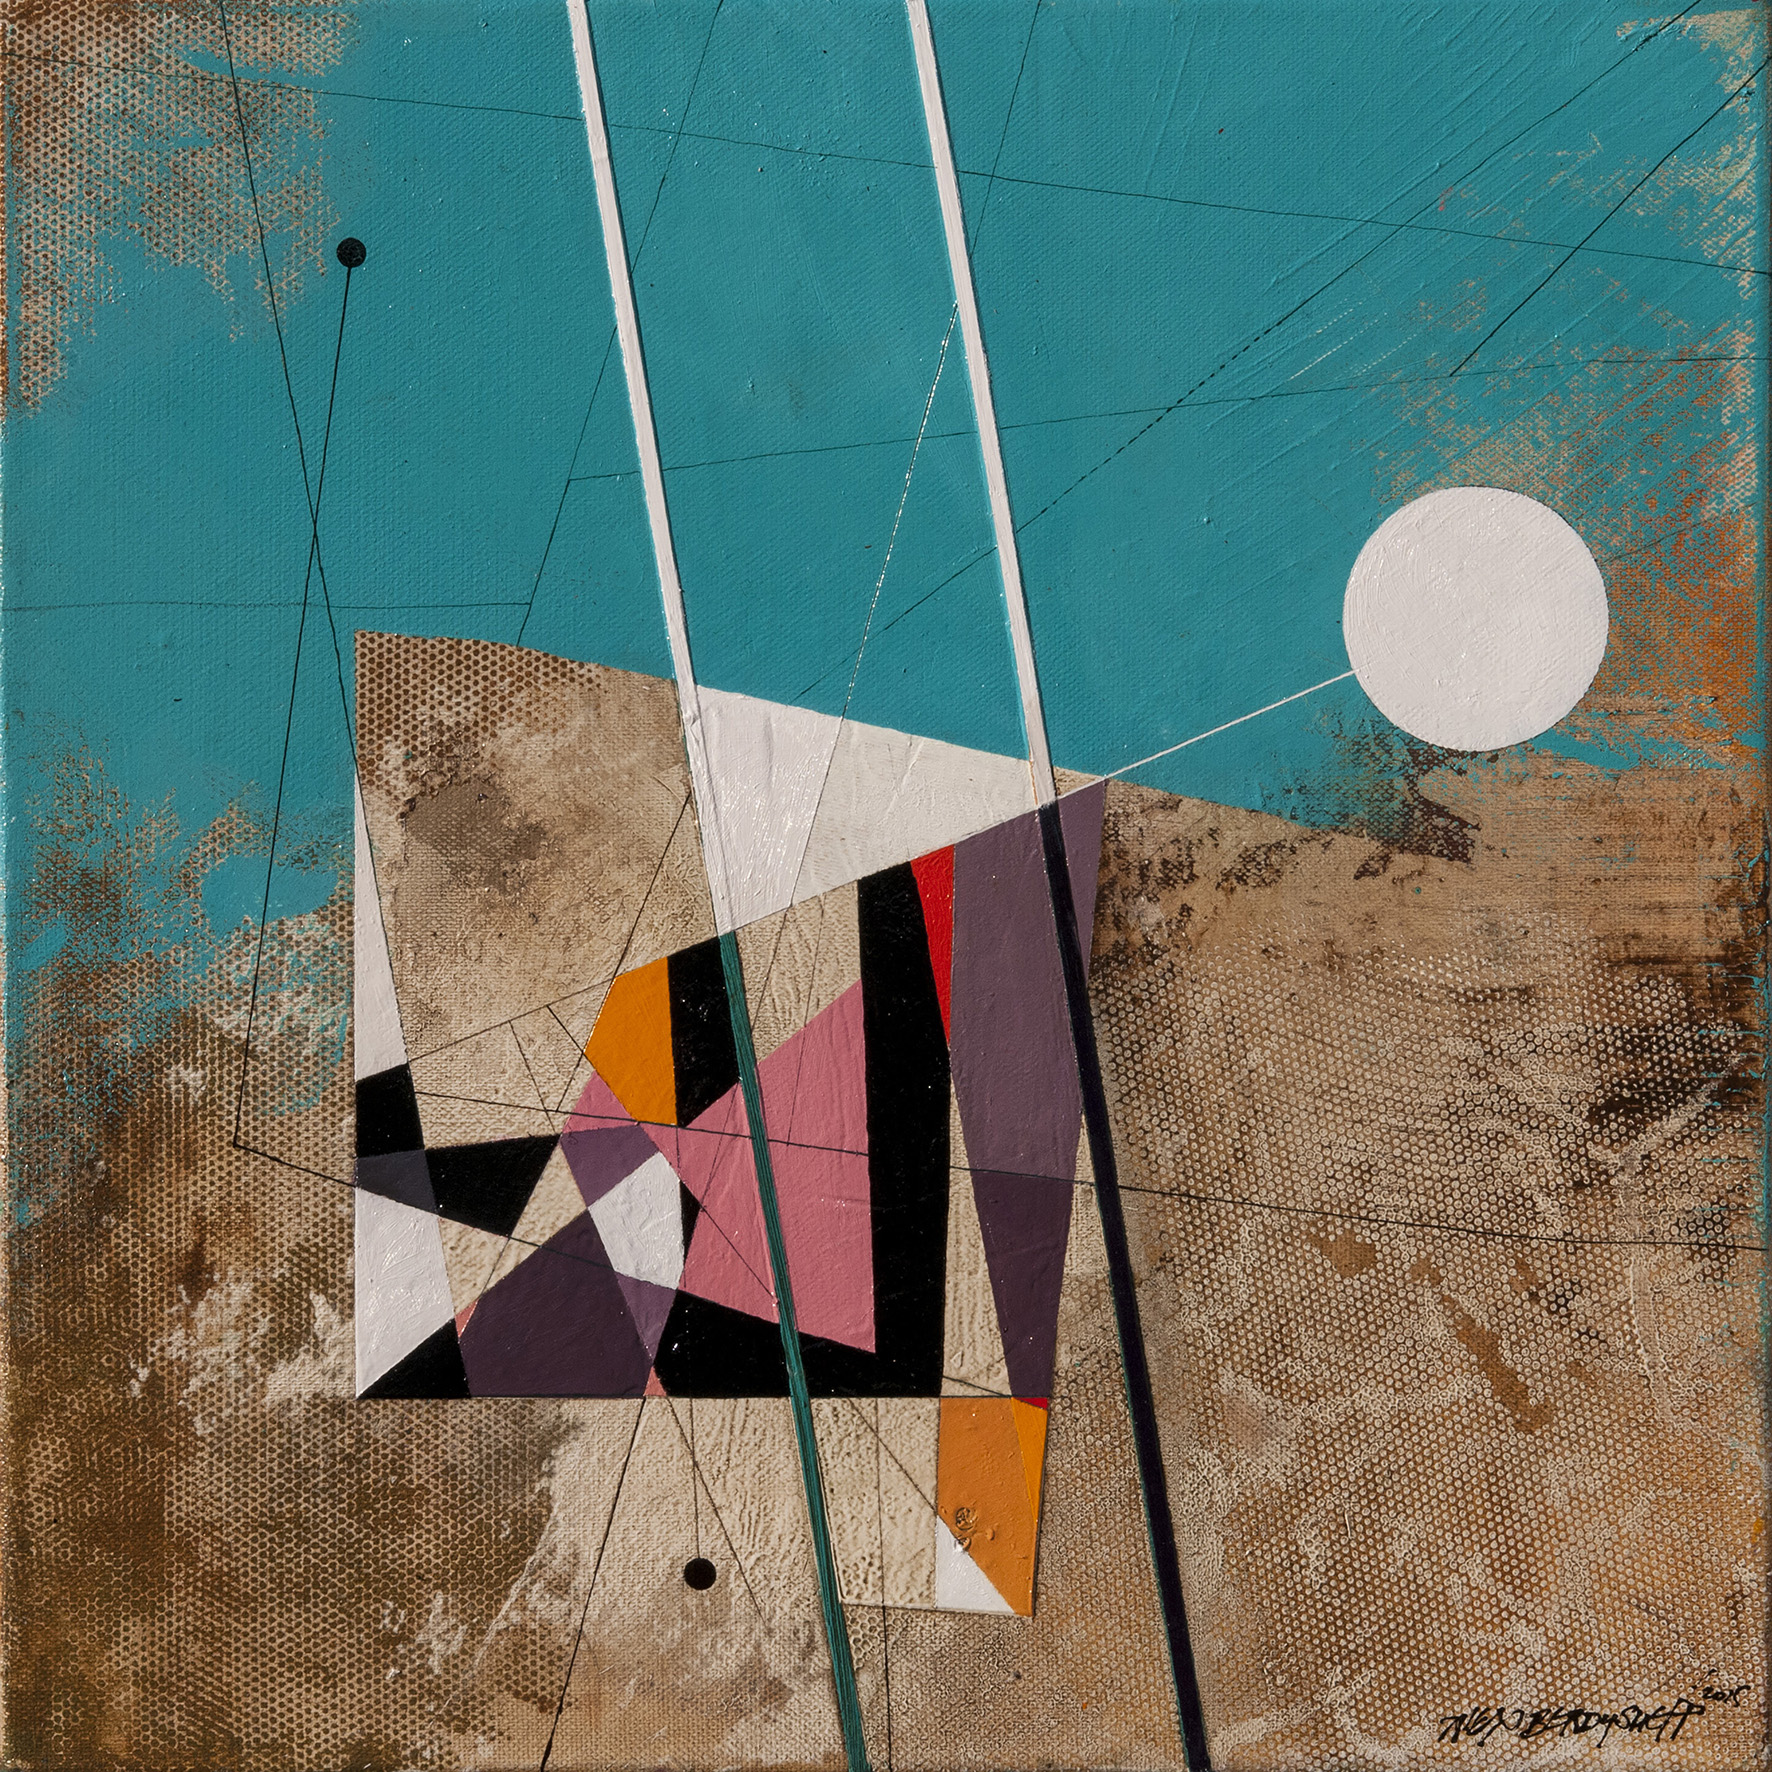 Rhythm IV, oil on canvas, 46x46 cm, 2015